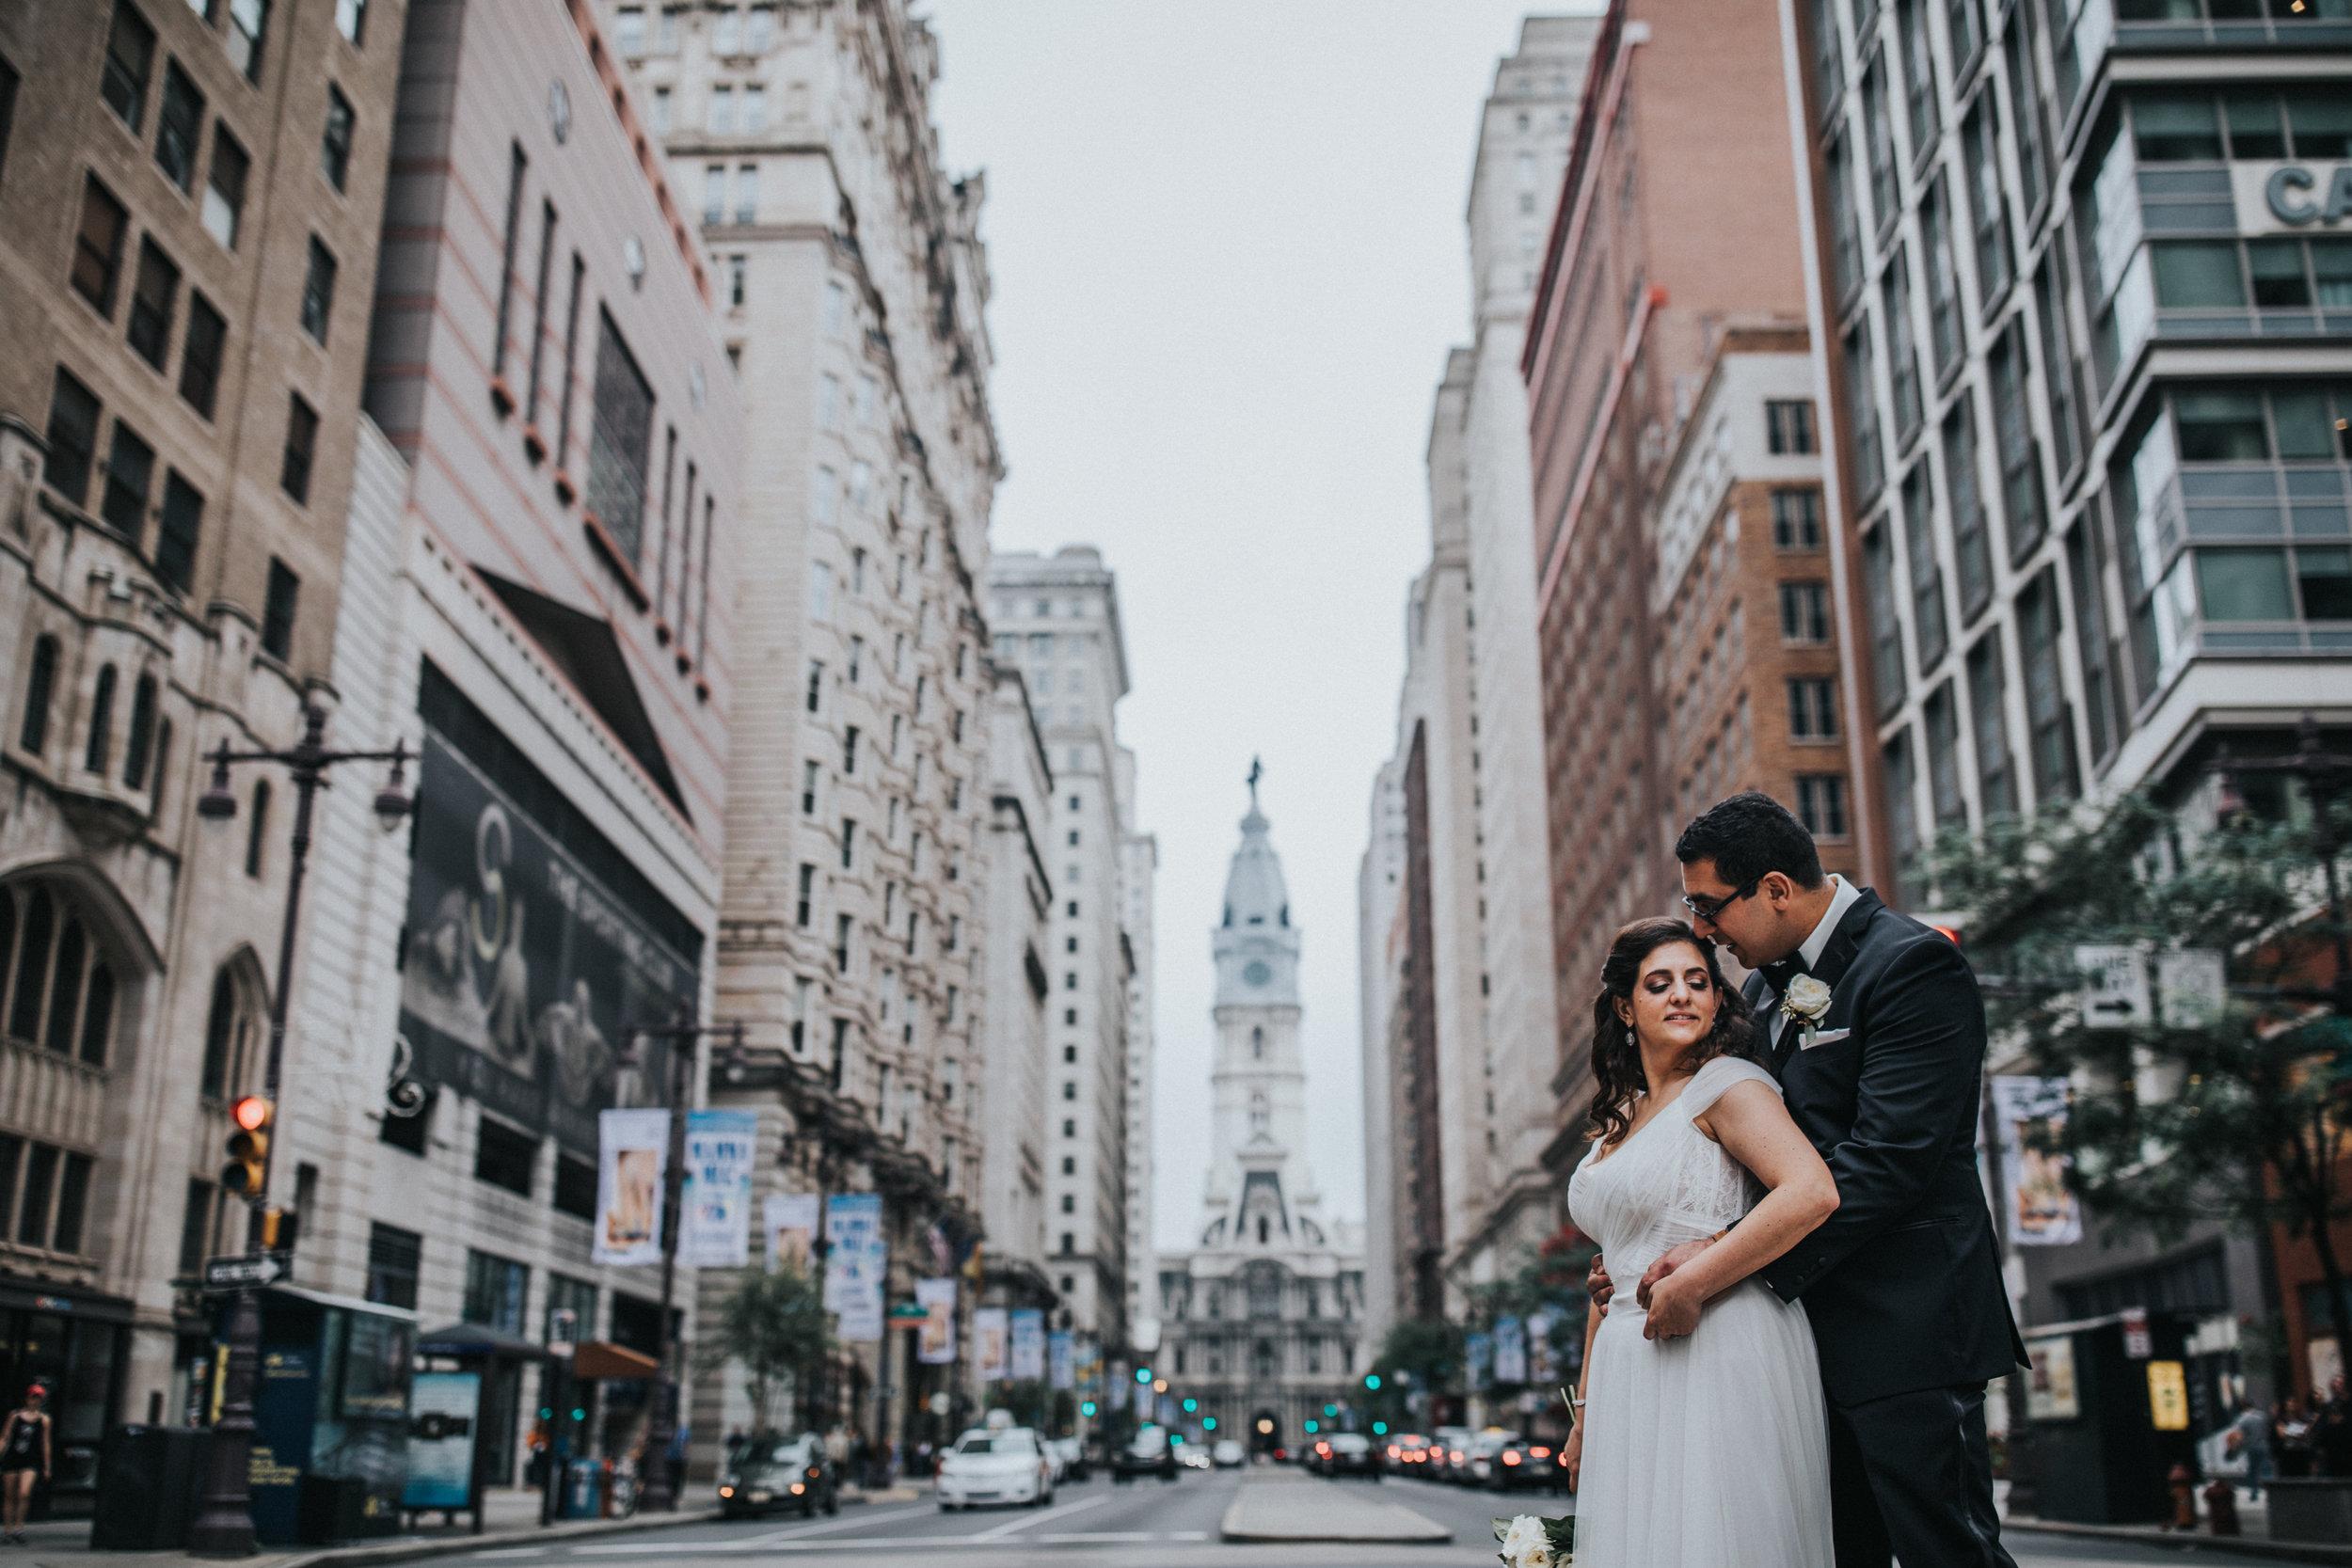 JennaLynnPhotography-NJWeddingPhotographer-Philadelphia-Wedding-ArtsBallroom-BridalParty-70.jpg